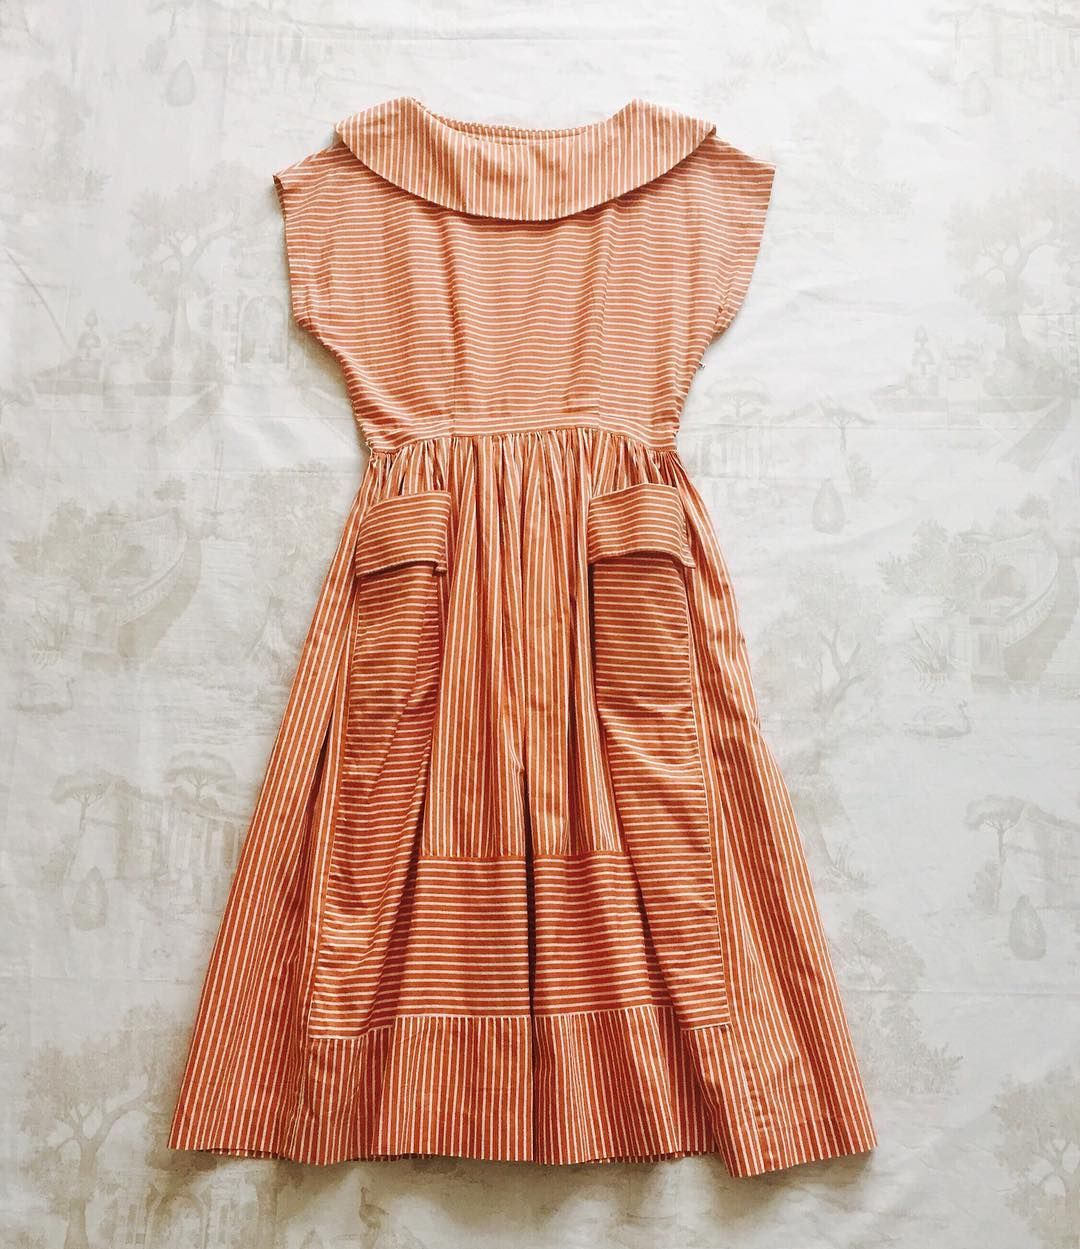 1950s-60s TerracottaWhite Stripe Dress #fab.#vintage#vintagefashion #vintageshop #1950sfashion #1960sfashion #1950sdress #1960sdress #ヴィンテージ#ヴィンテージドレス